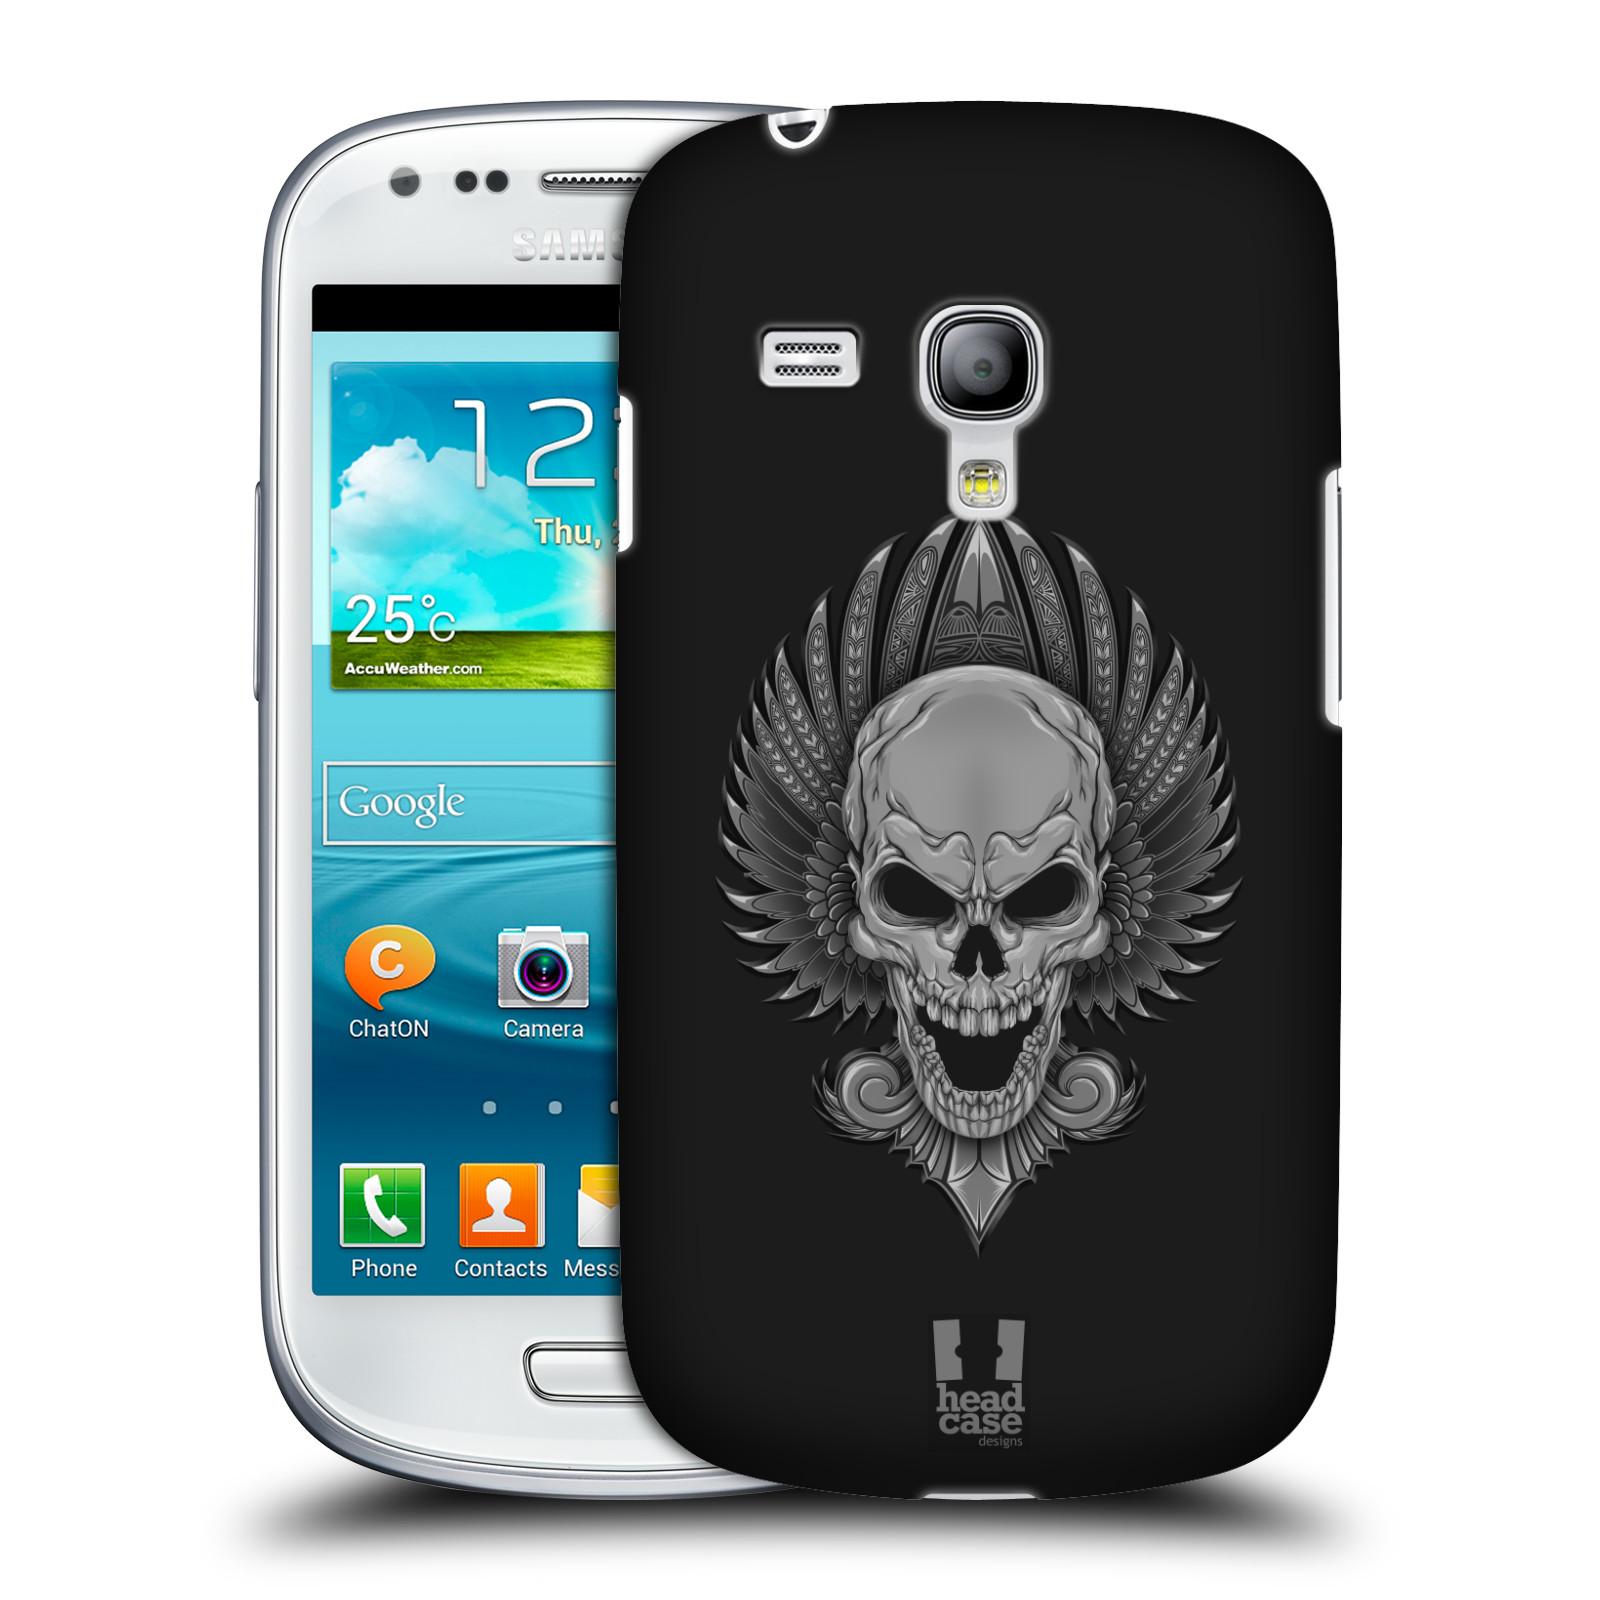 Silikonové pouzdro na mobil Samsung Galaxy S III Mini VE - Head Case - Krutá lebka (Plastový kryt či obal na mobilní telefon s krutým motivem pro Samsung Galaxy S3 Mini VE GT-i8200)